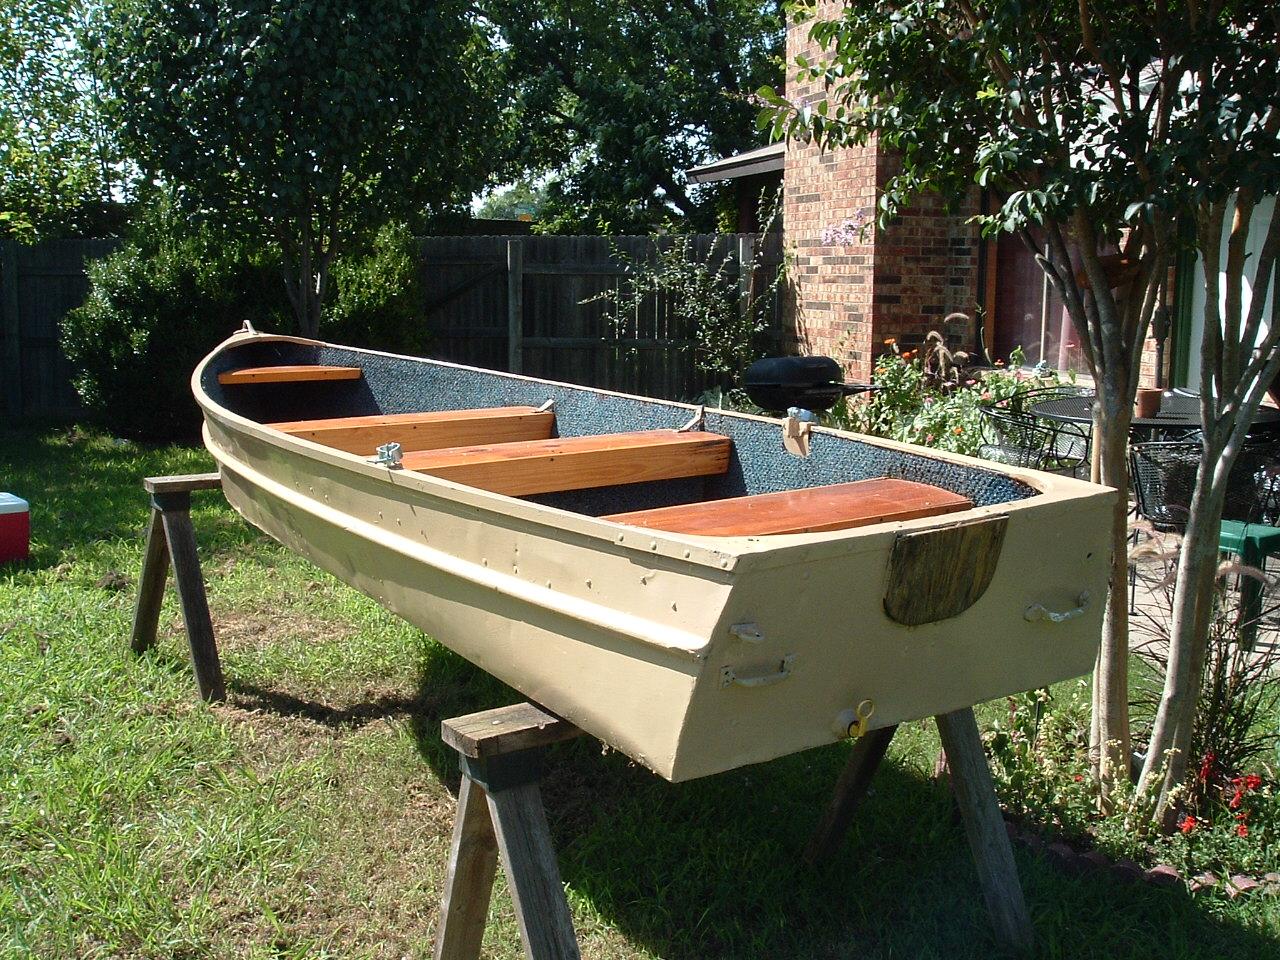 Restore And Repaint Aluminum Jon Boat Classic Boat Design Net